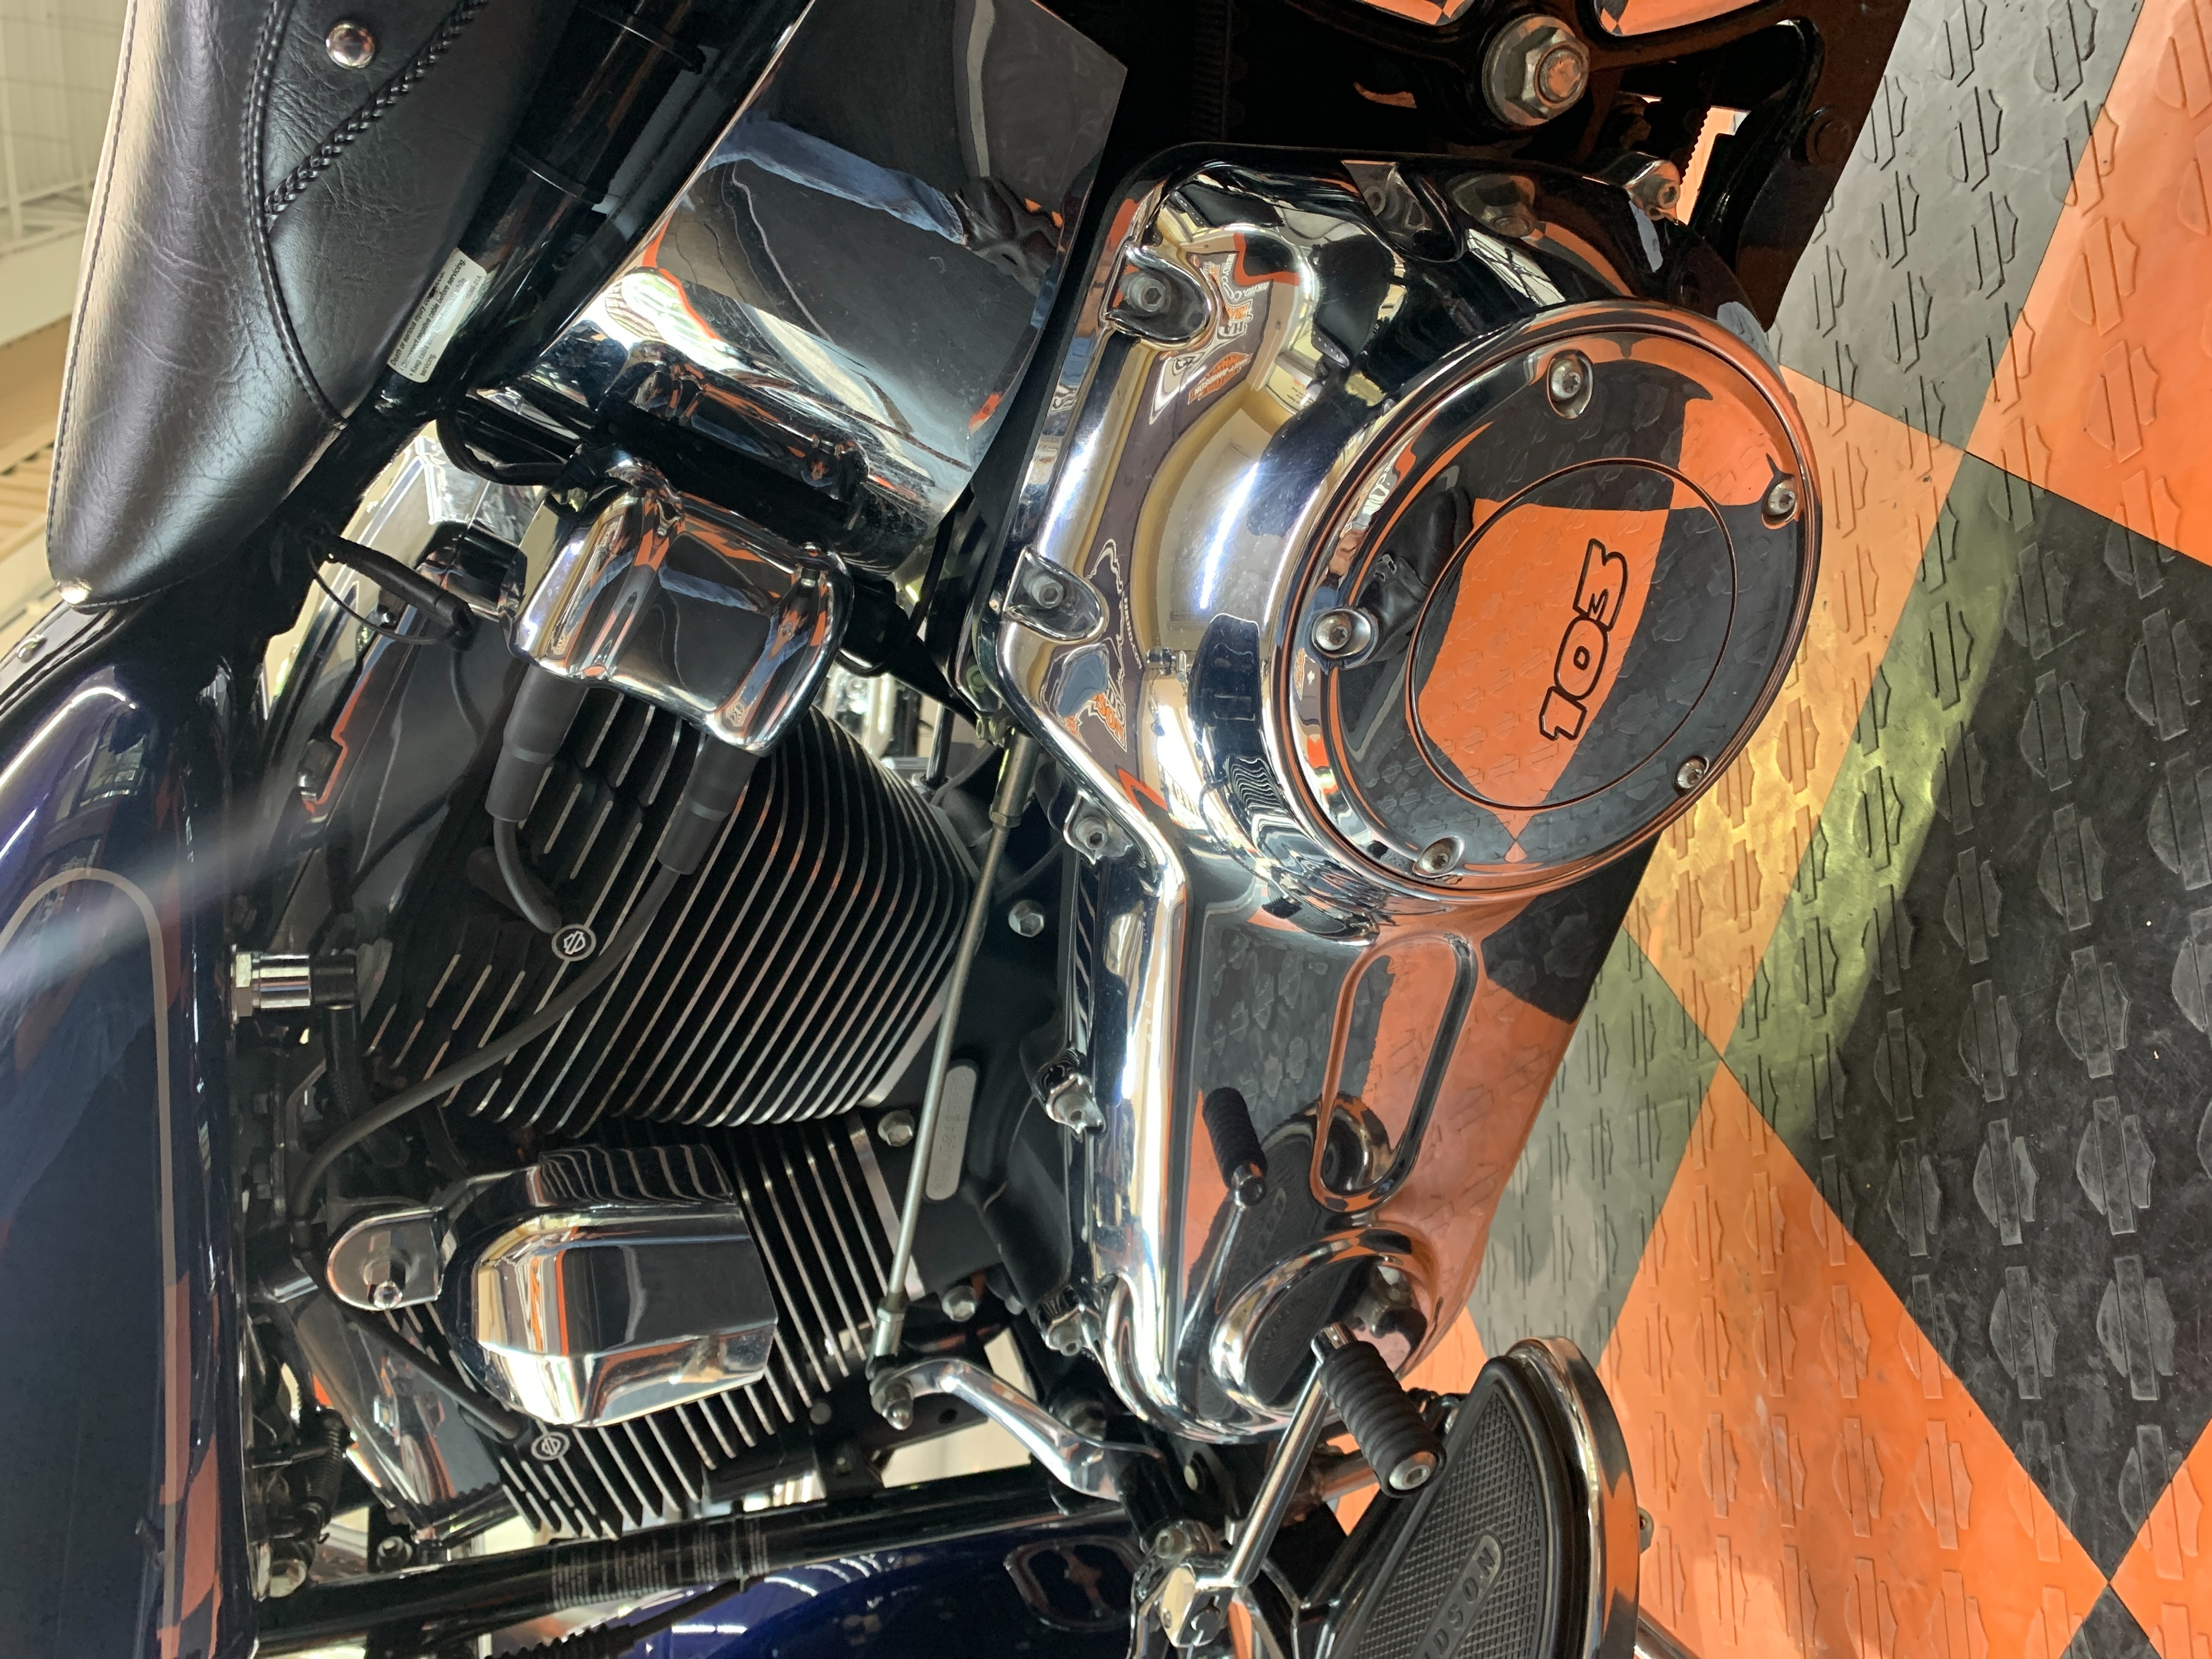 2013 Harley-Davidson Softail Heritage Softail Classic at Hampton Roads Harley-Davidson